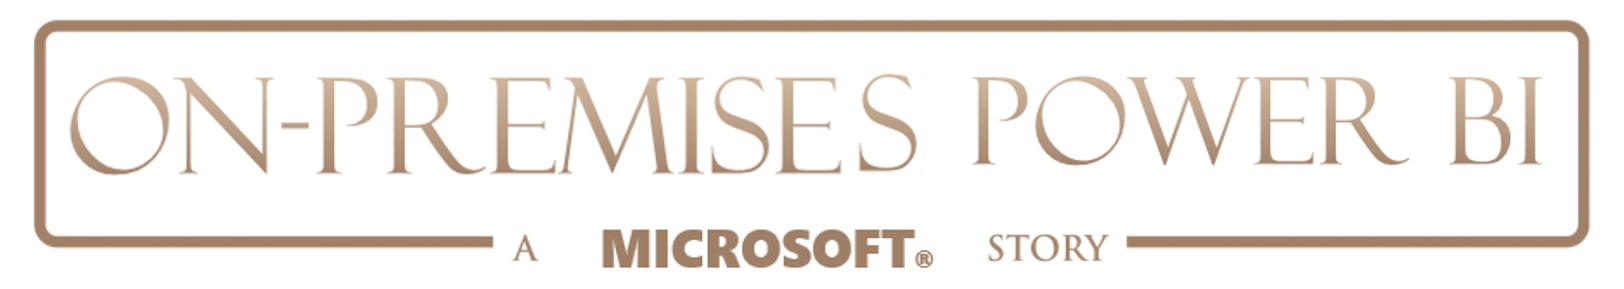 OnPremisesPowerBI_MicrosoftStory